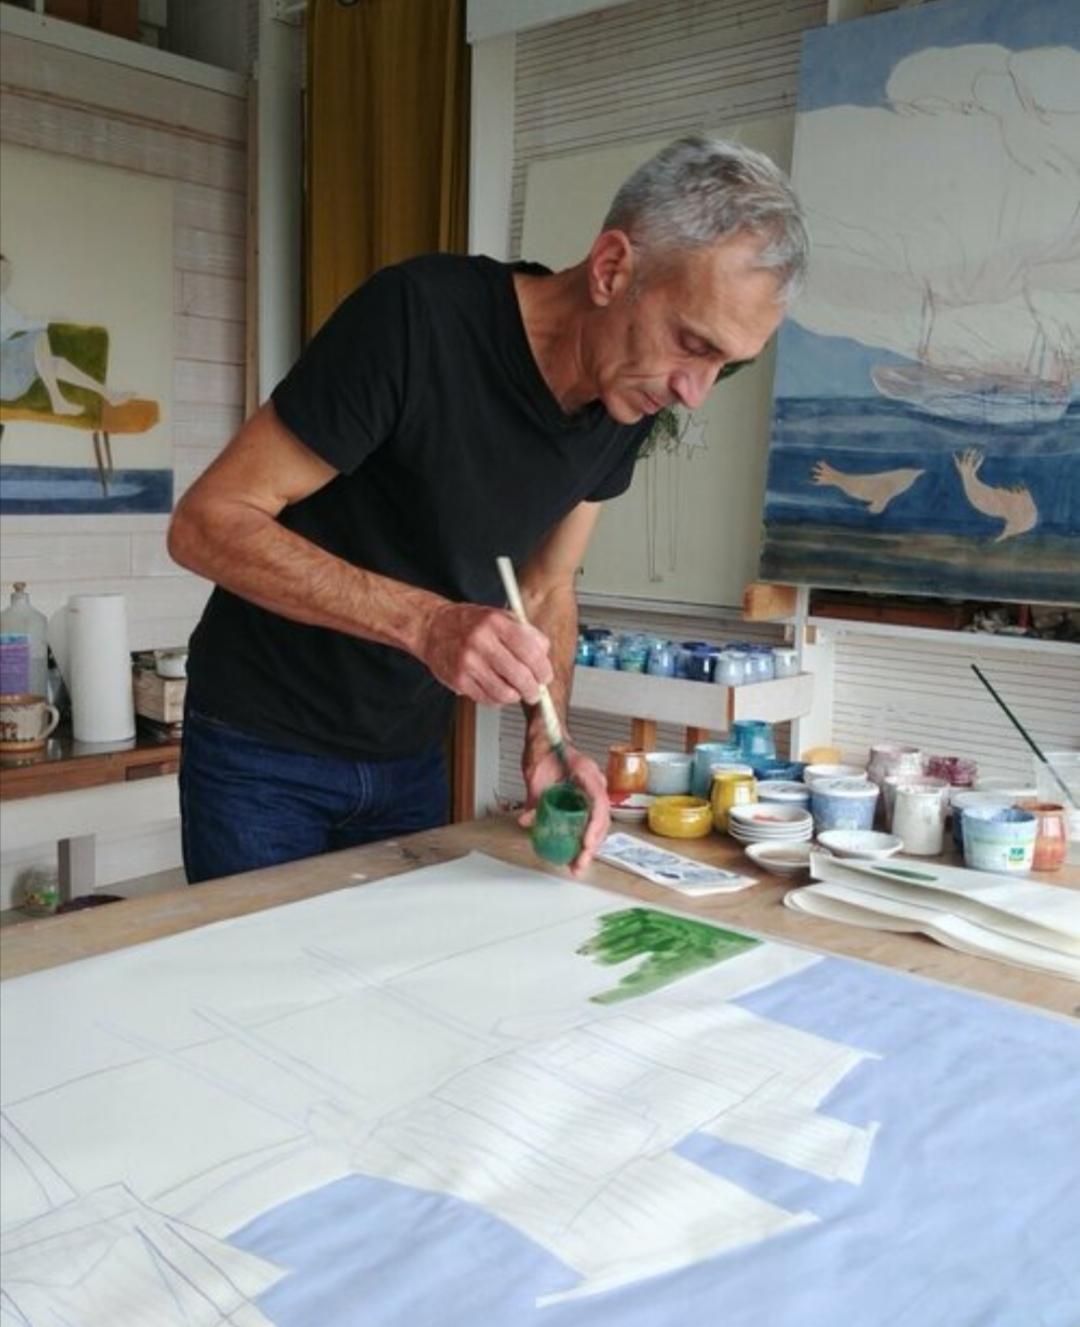 Stephane Dauthuille Artiste-Peintre Exposition Noirmoutier